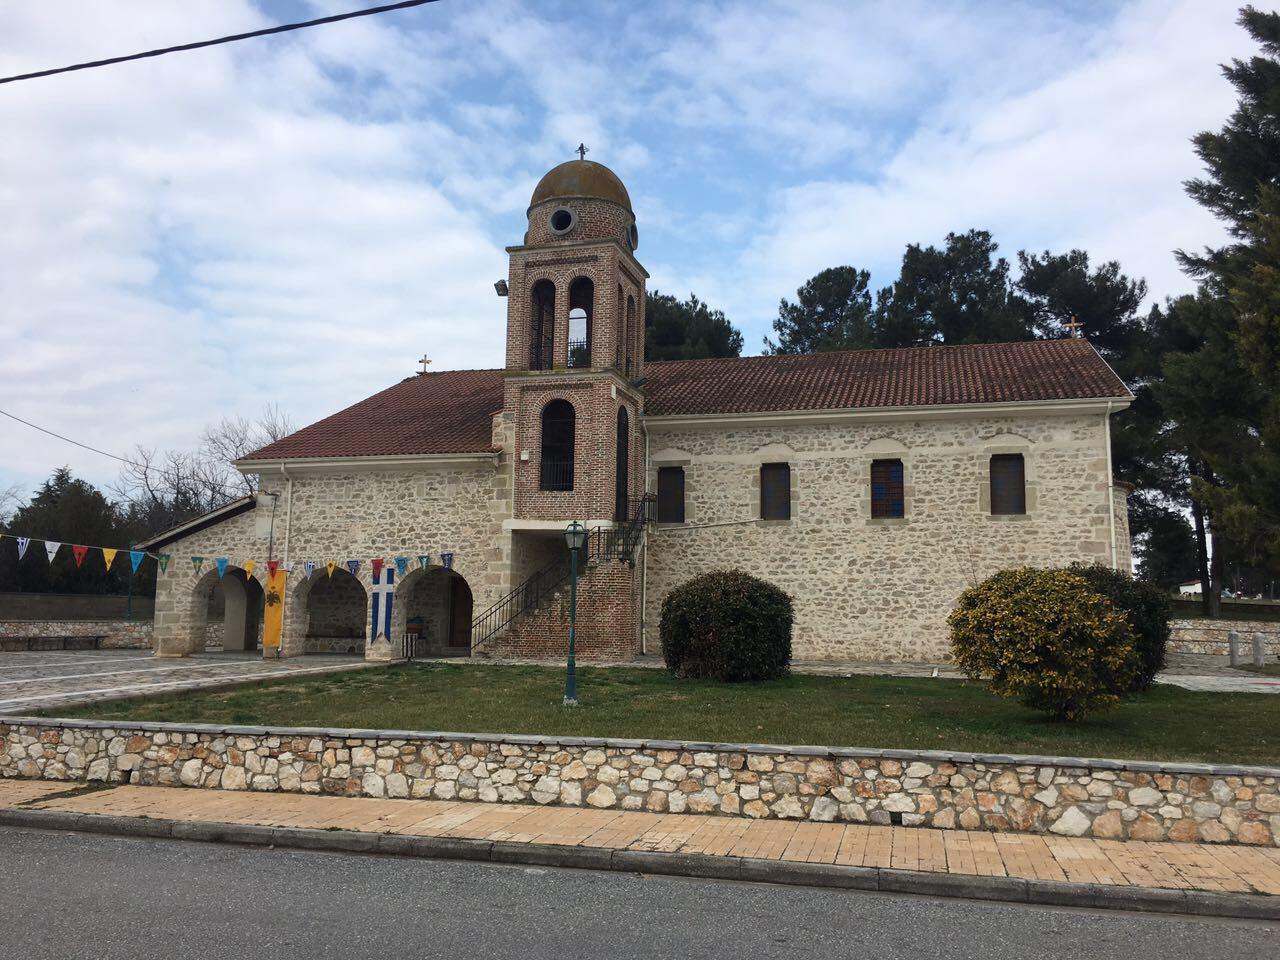 AgXaralampos Nikaia 2019 1 - Στον πανηγυρικό εσπερινό του Αγίου Χαραλάμπους Νικαίας ο Σεβασμιώτατος